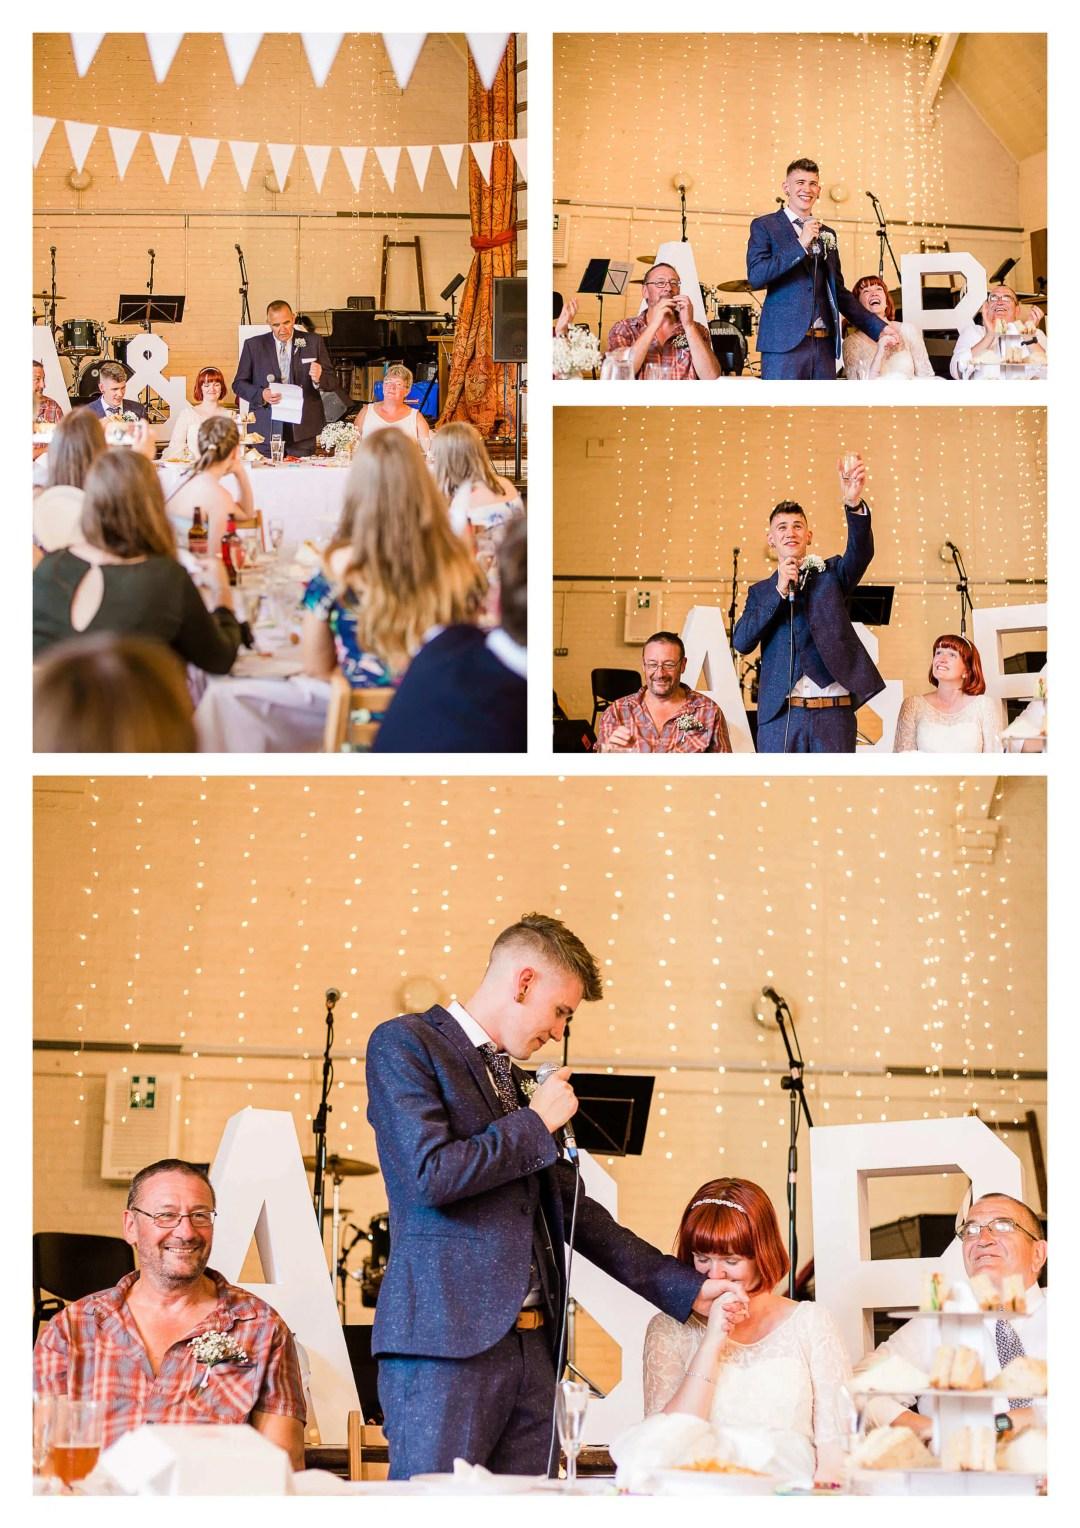 Surrey town hall wedding venue | Guildford wedding photographer